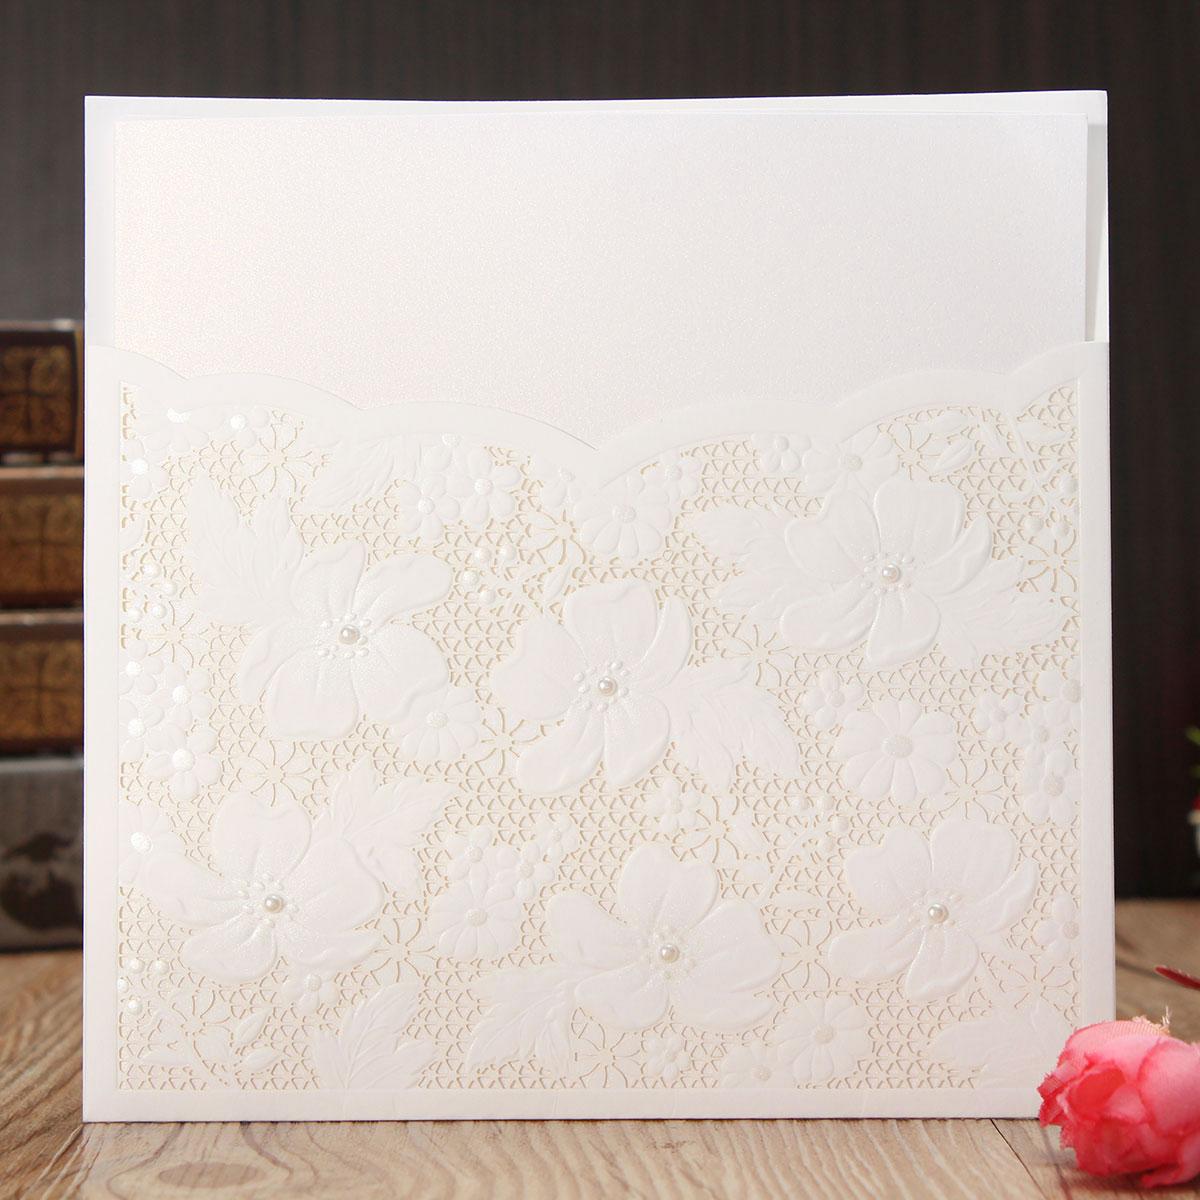 10Pcs Laser Cut Flower Hollow Out Bead Wedding Evening Invitations Cards Envelopes Seals